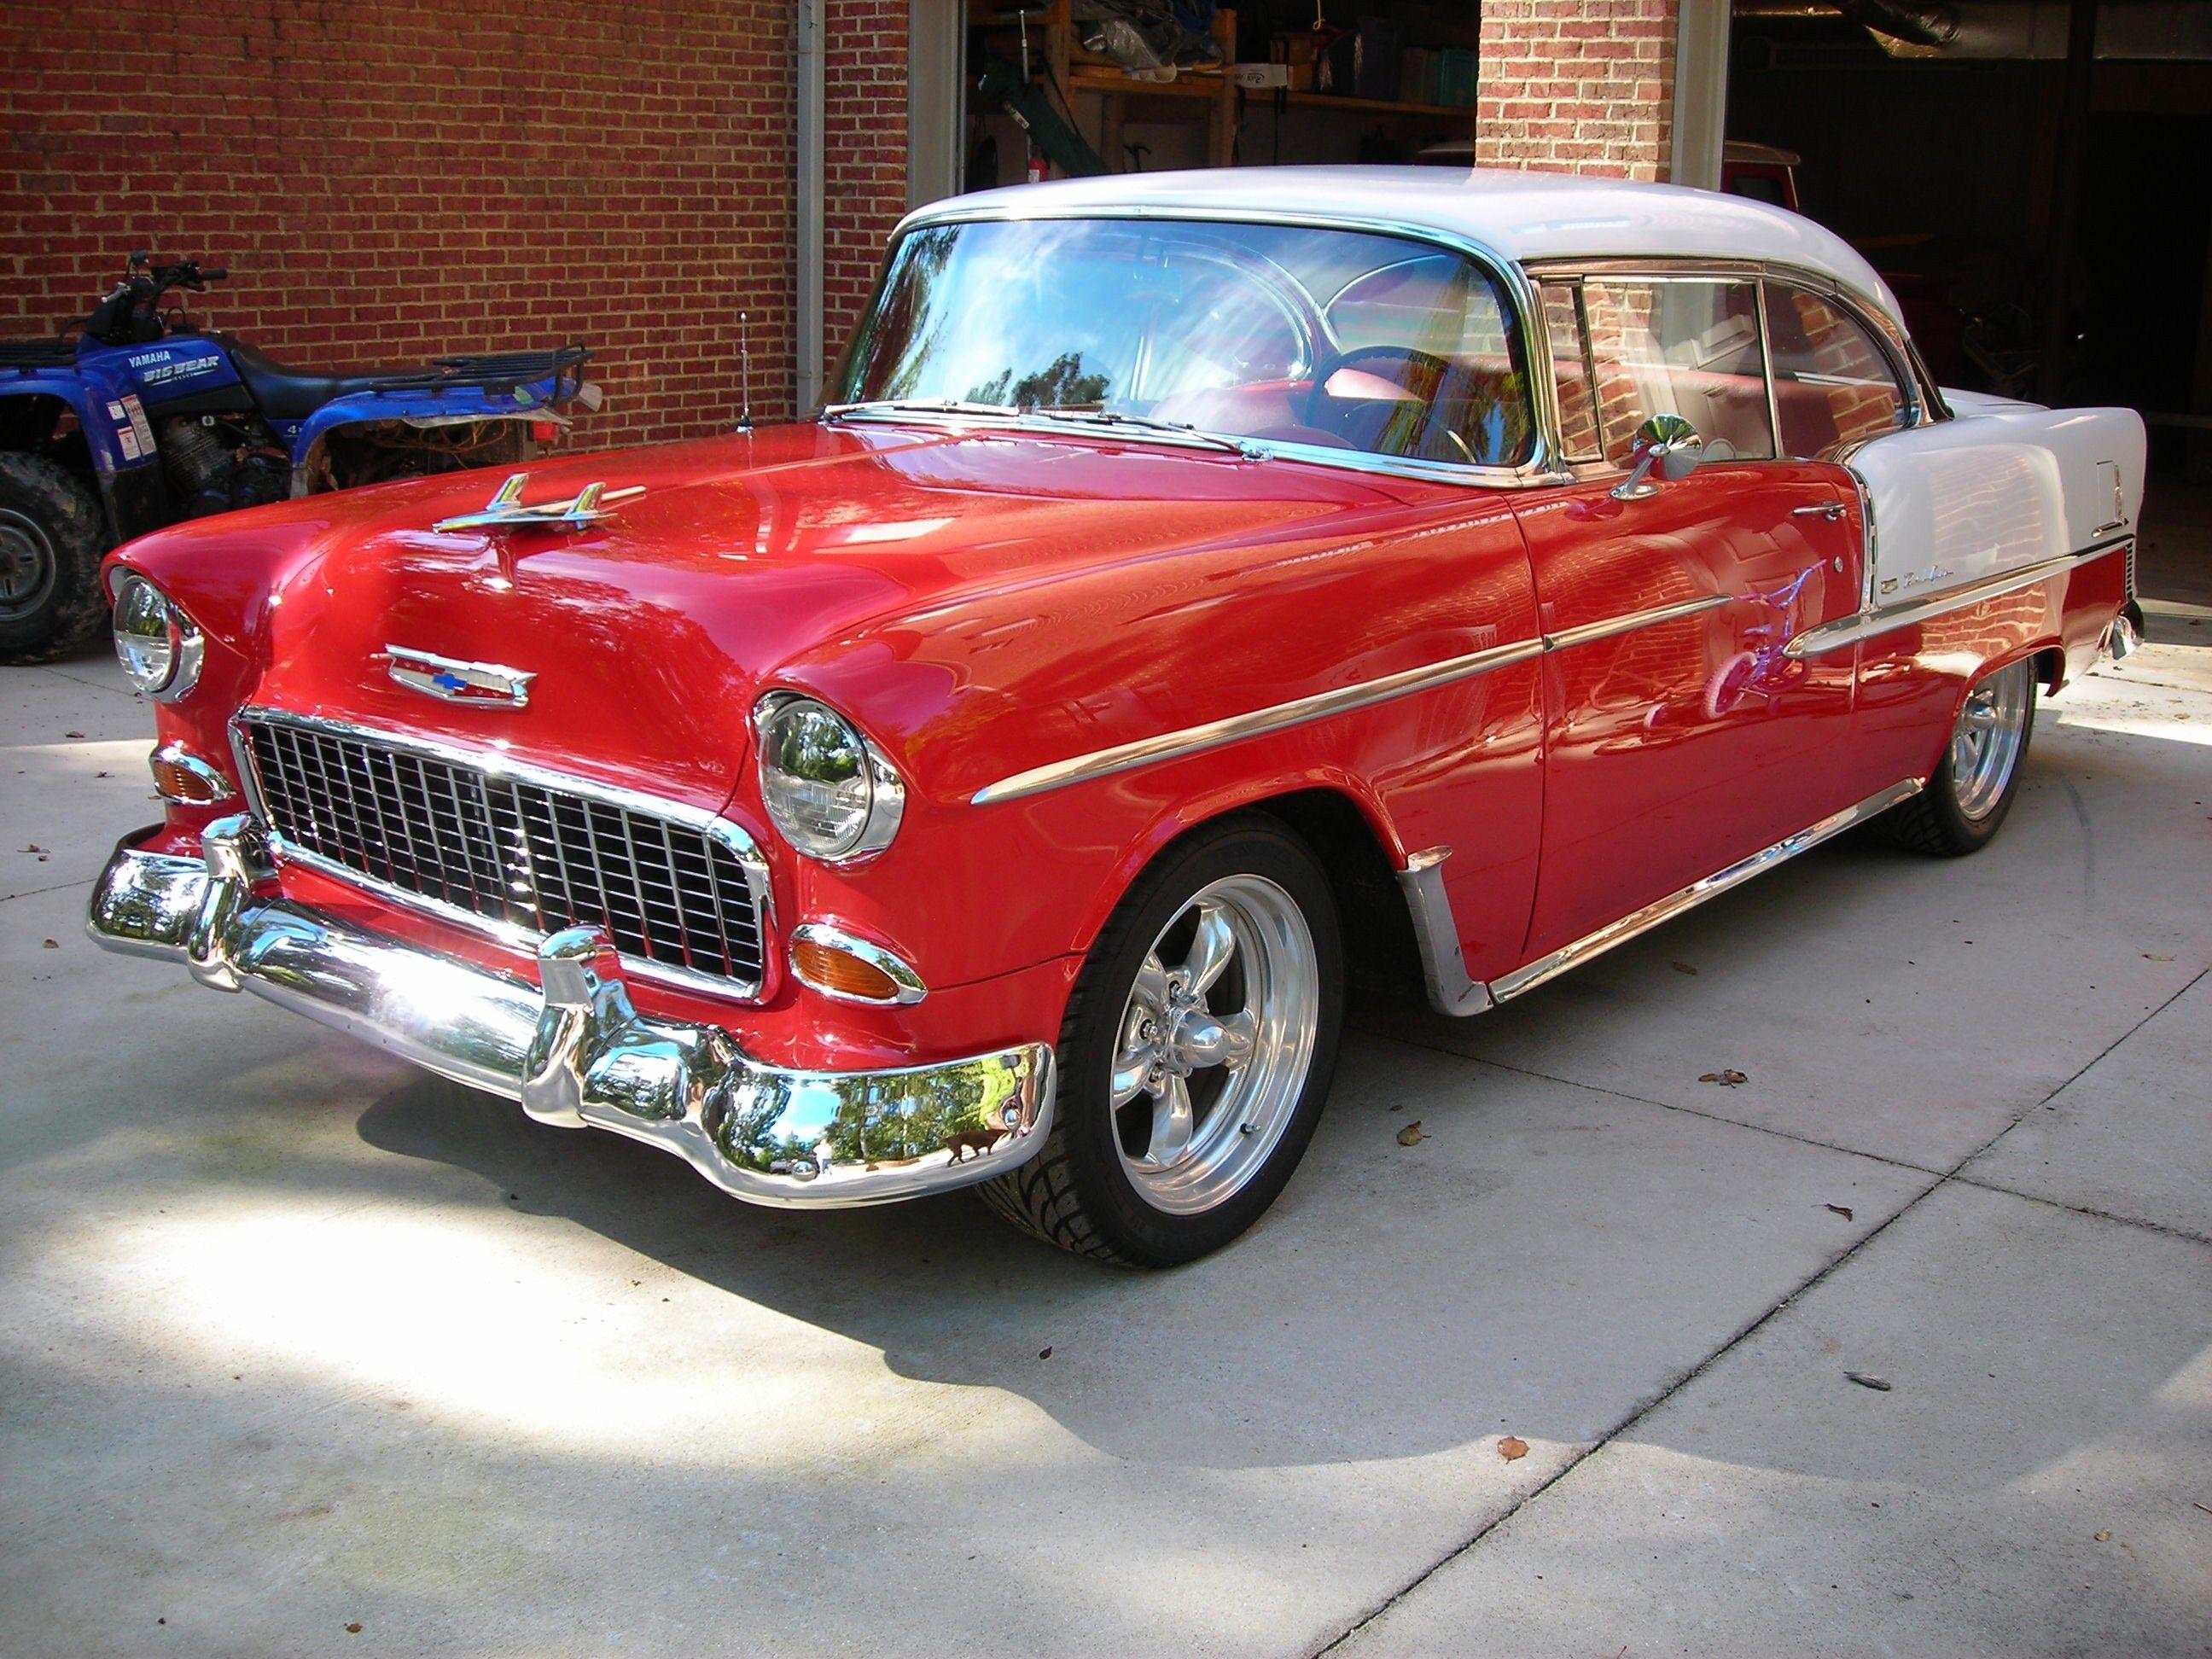 Appraising A Classic Car